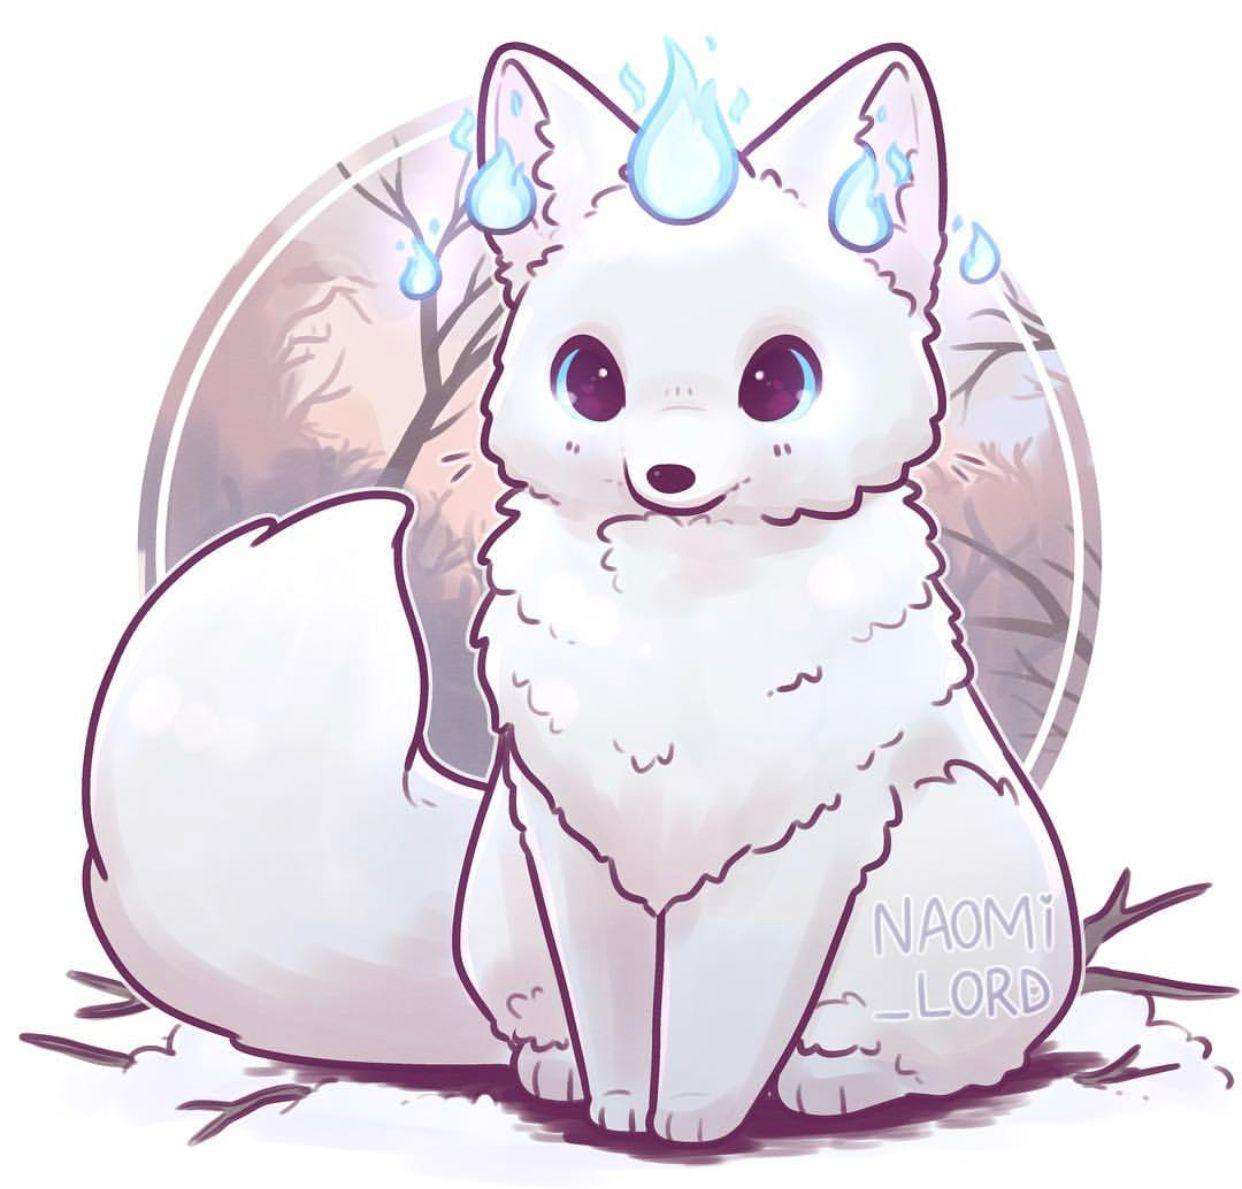 A Winter Fox Naomi Lord Cute Animal Drawings Cute Kawaii Drawings Cute Animal Drawings Kawaii